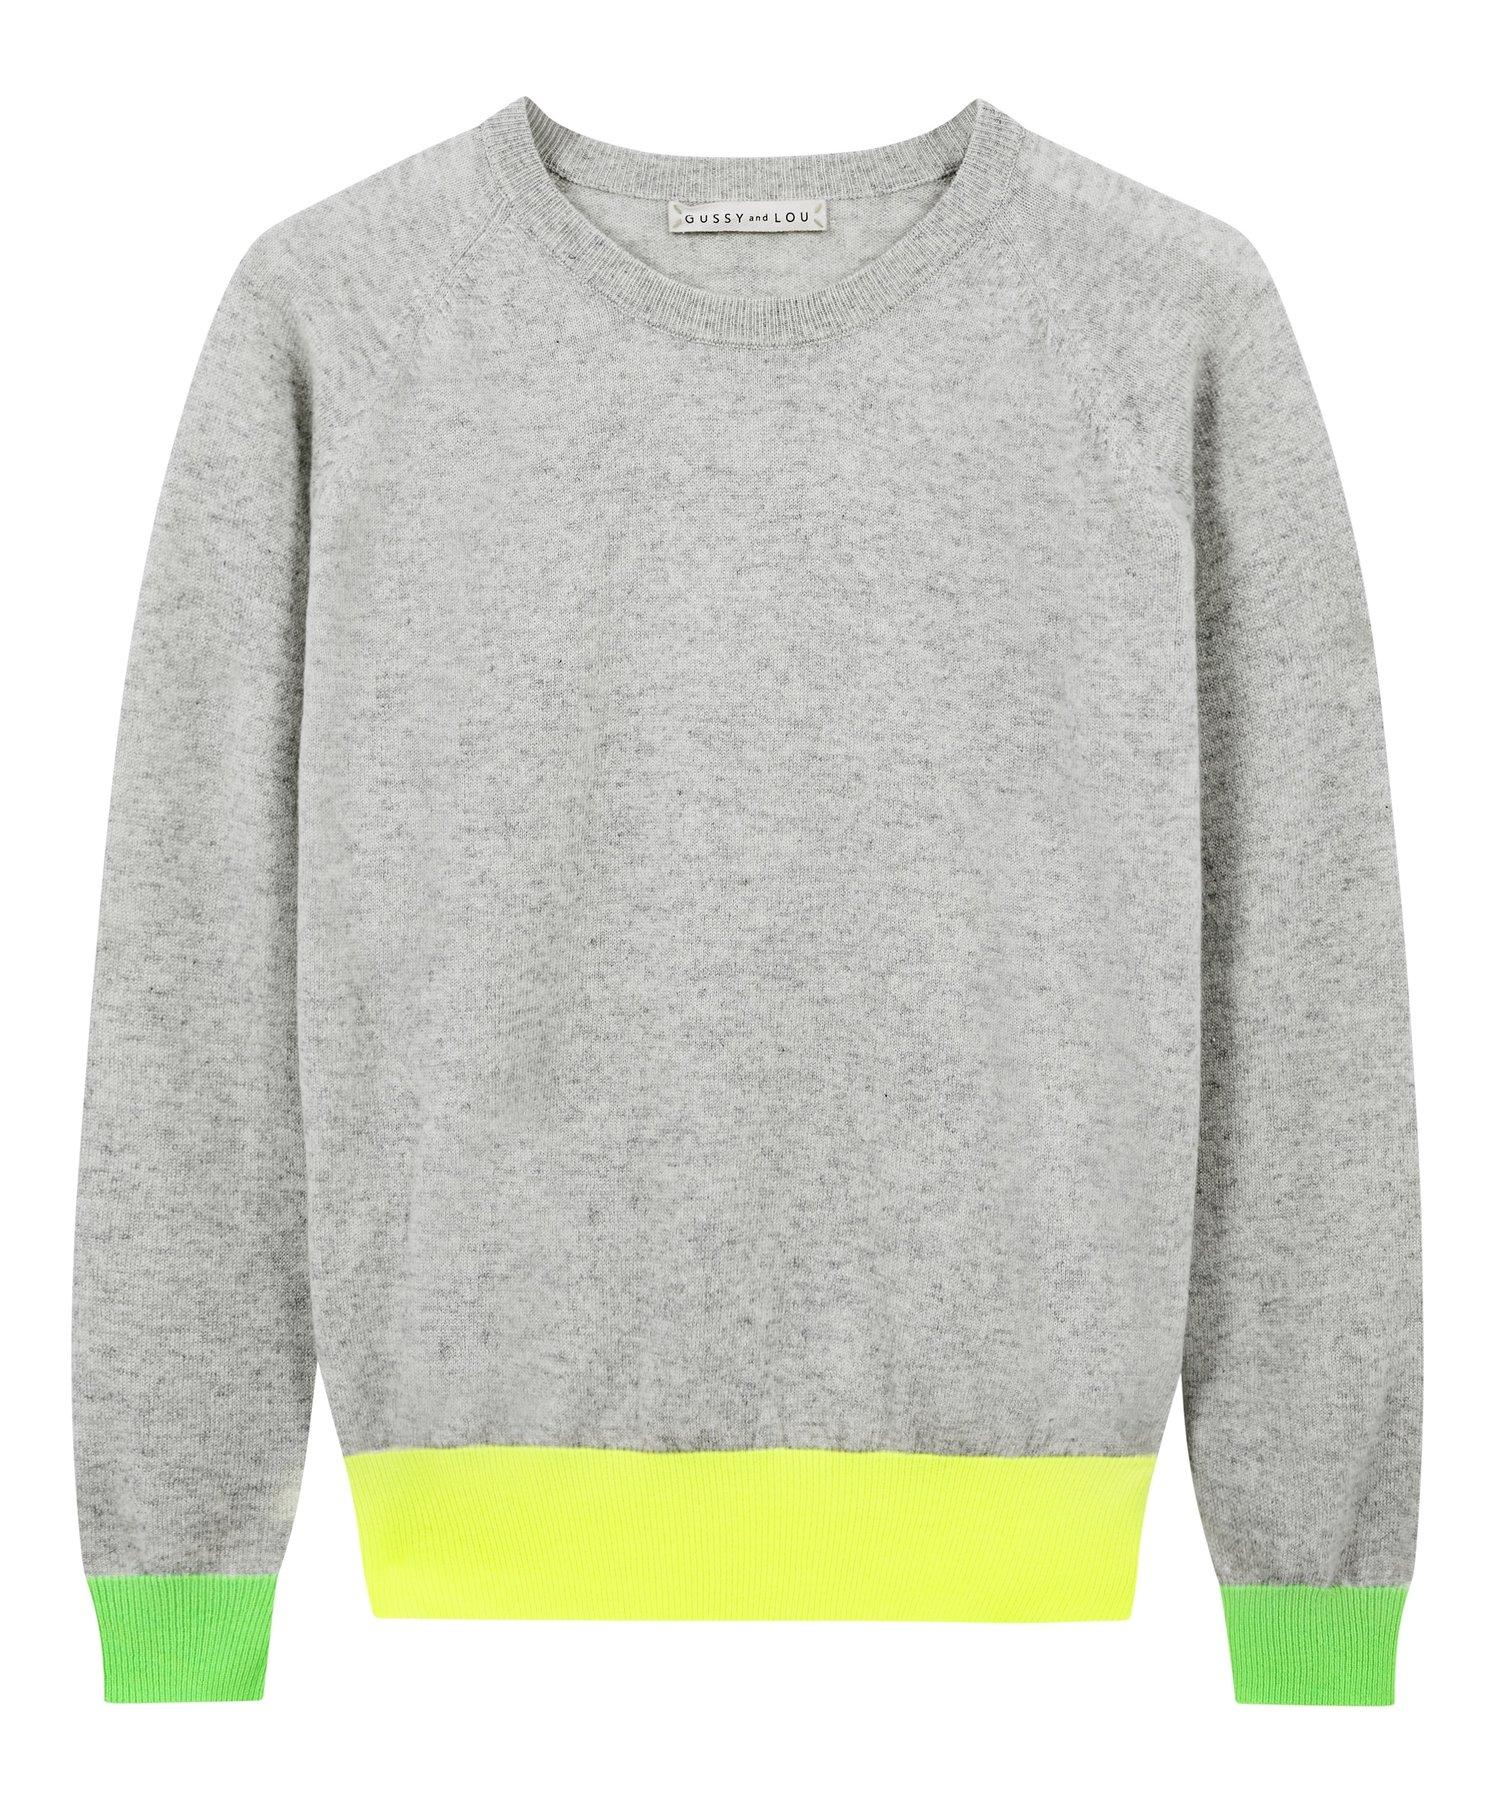 Ladies+Jumper_Light+Gray+Neon+Yellow+Green_F.jpg